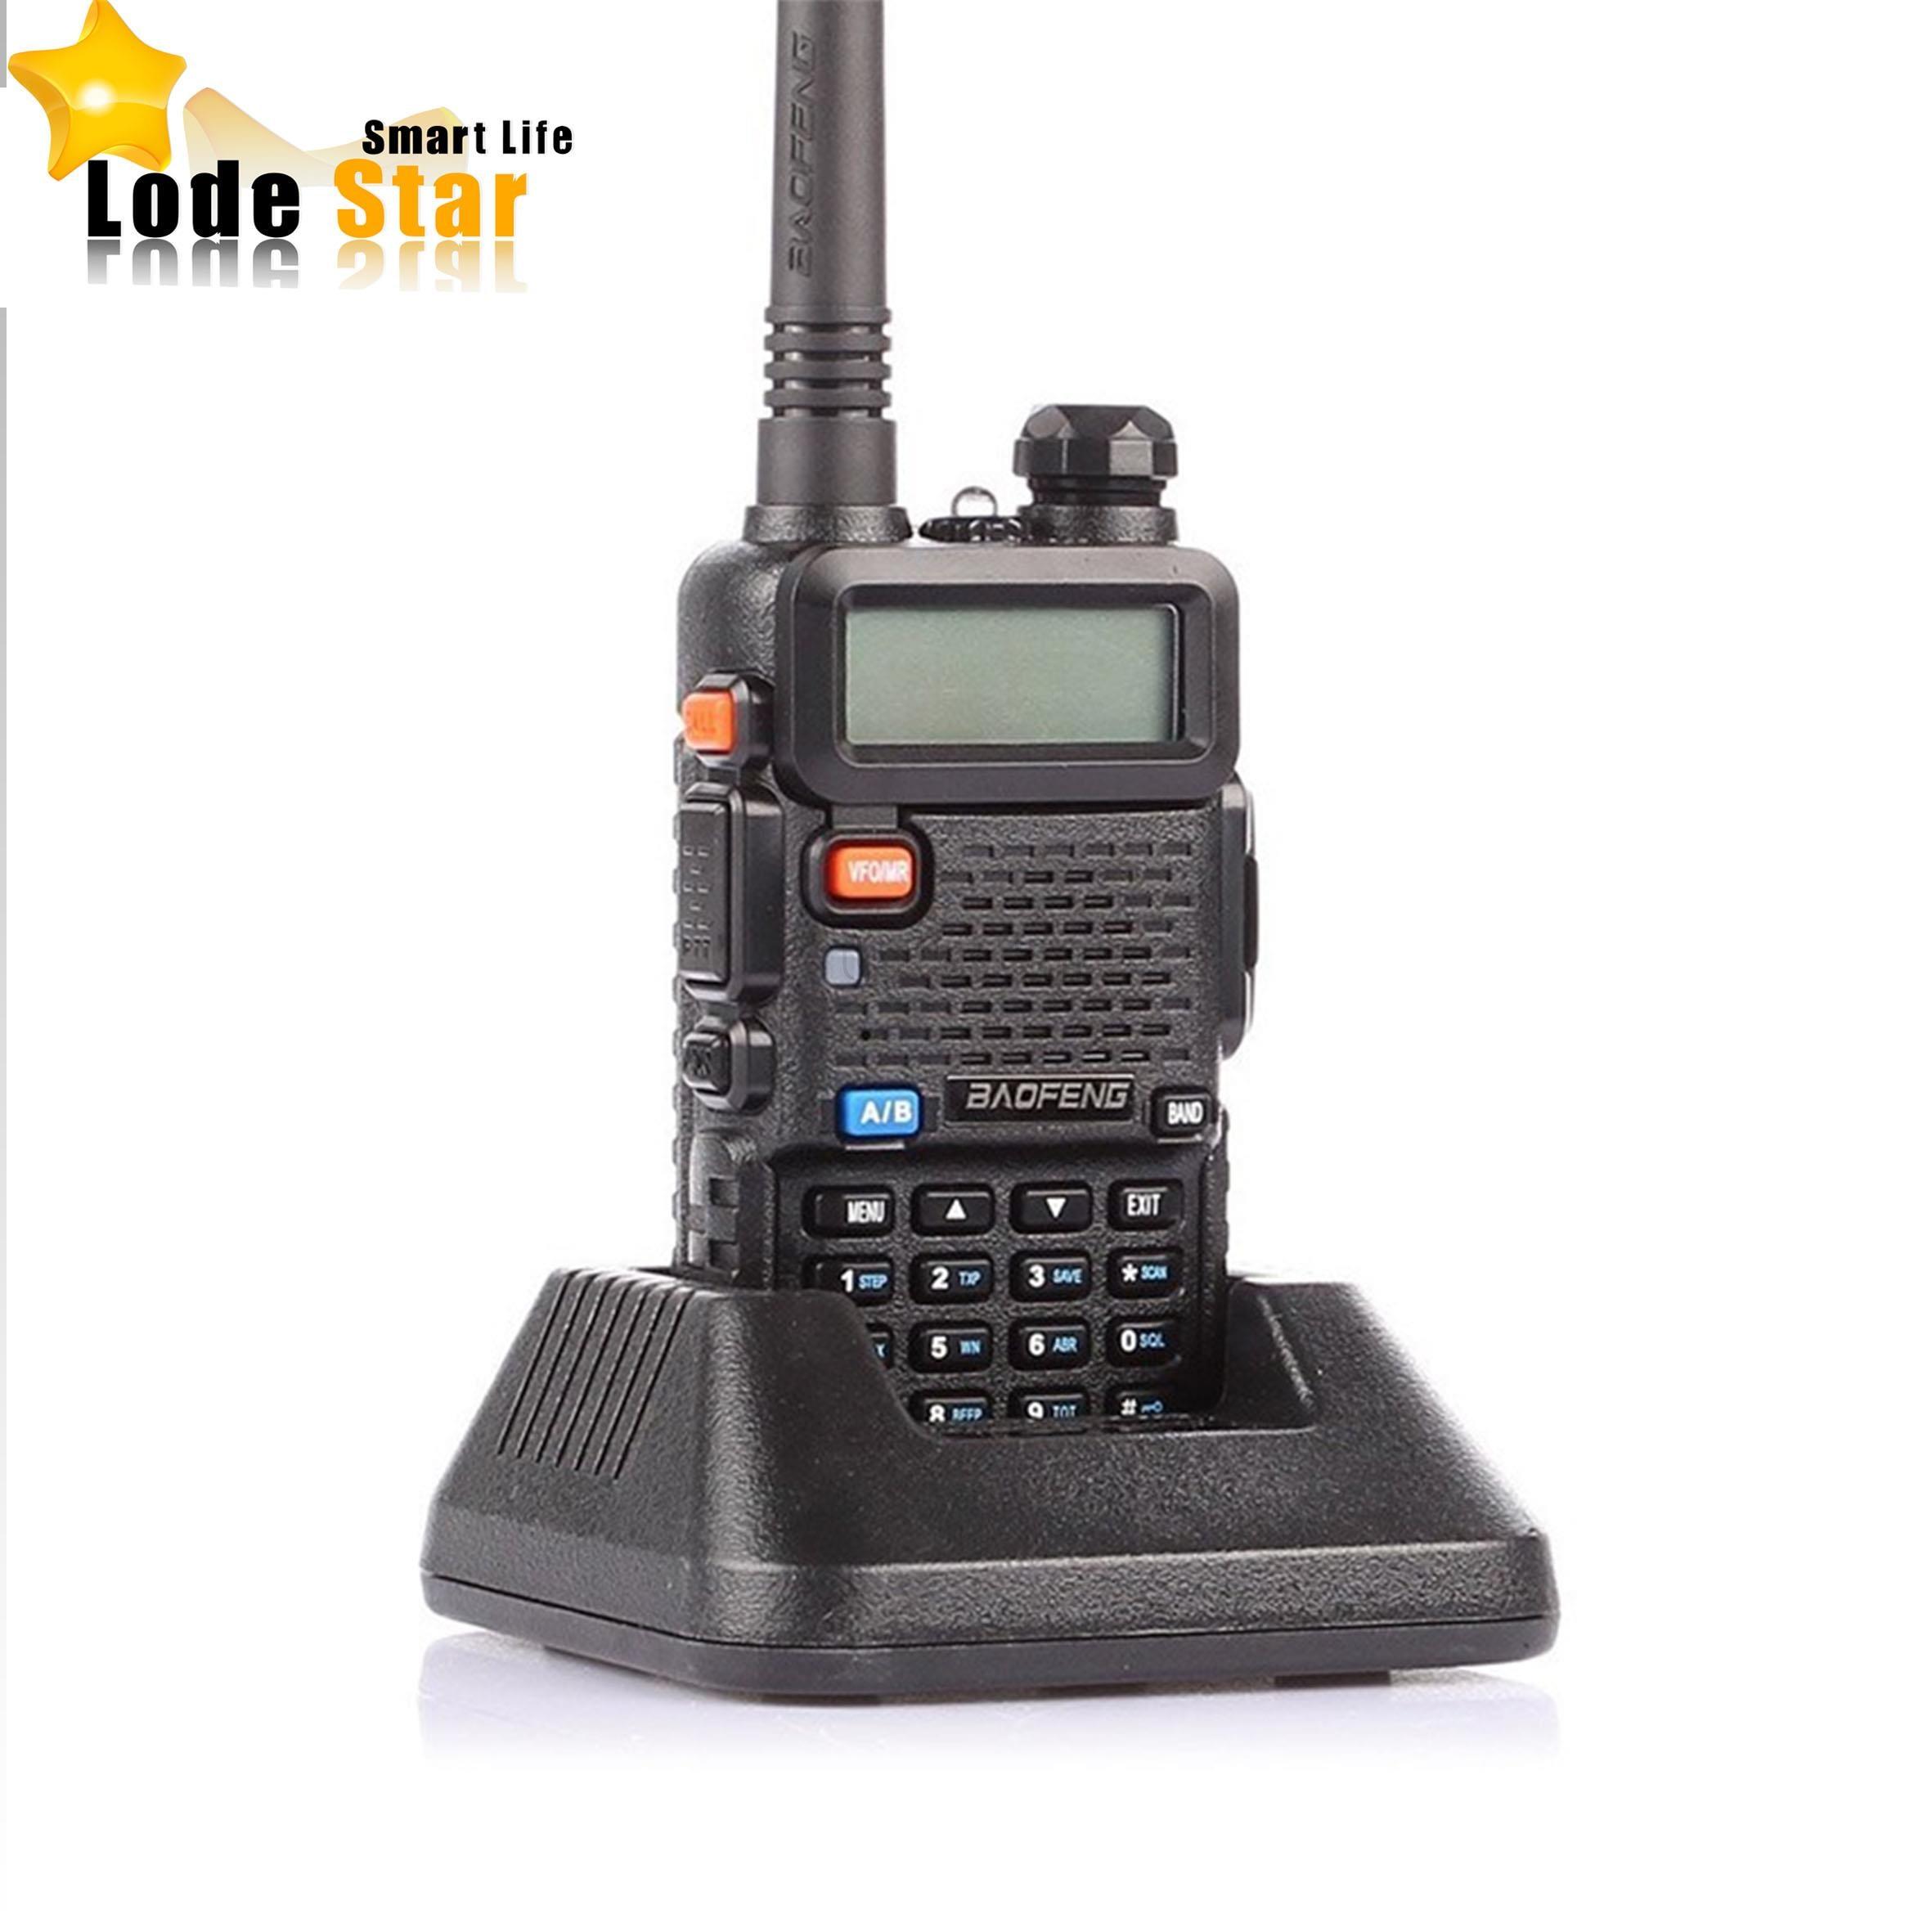 Original Brand BaoFeng UV-5R 5R Walkie Talkie136-174 /400-520Mhz Two Way Radio Portable CD Radio 5W Dual Band VHF&UHF interphone